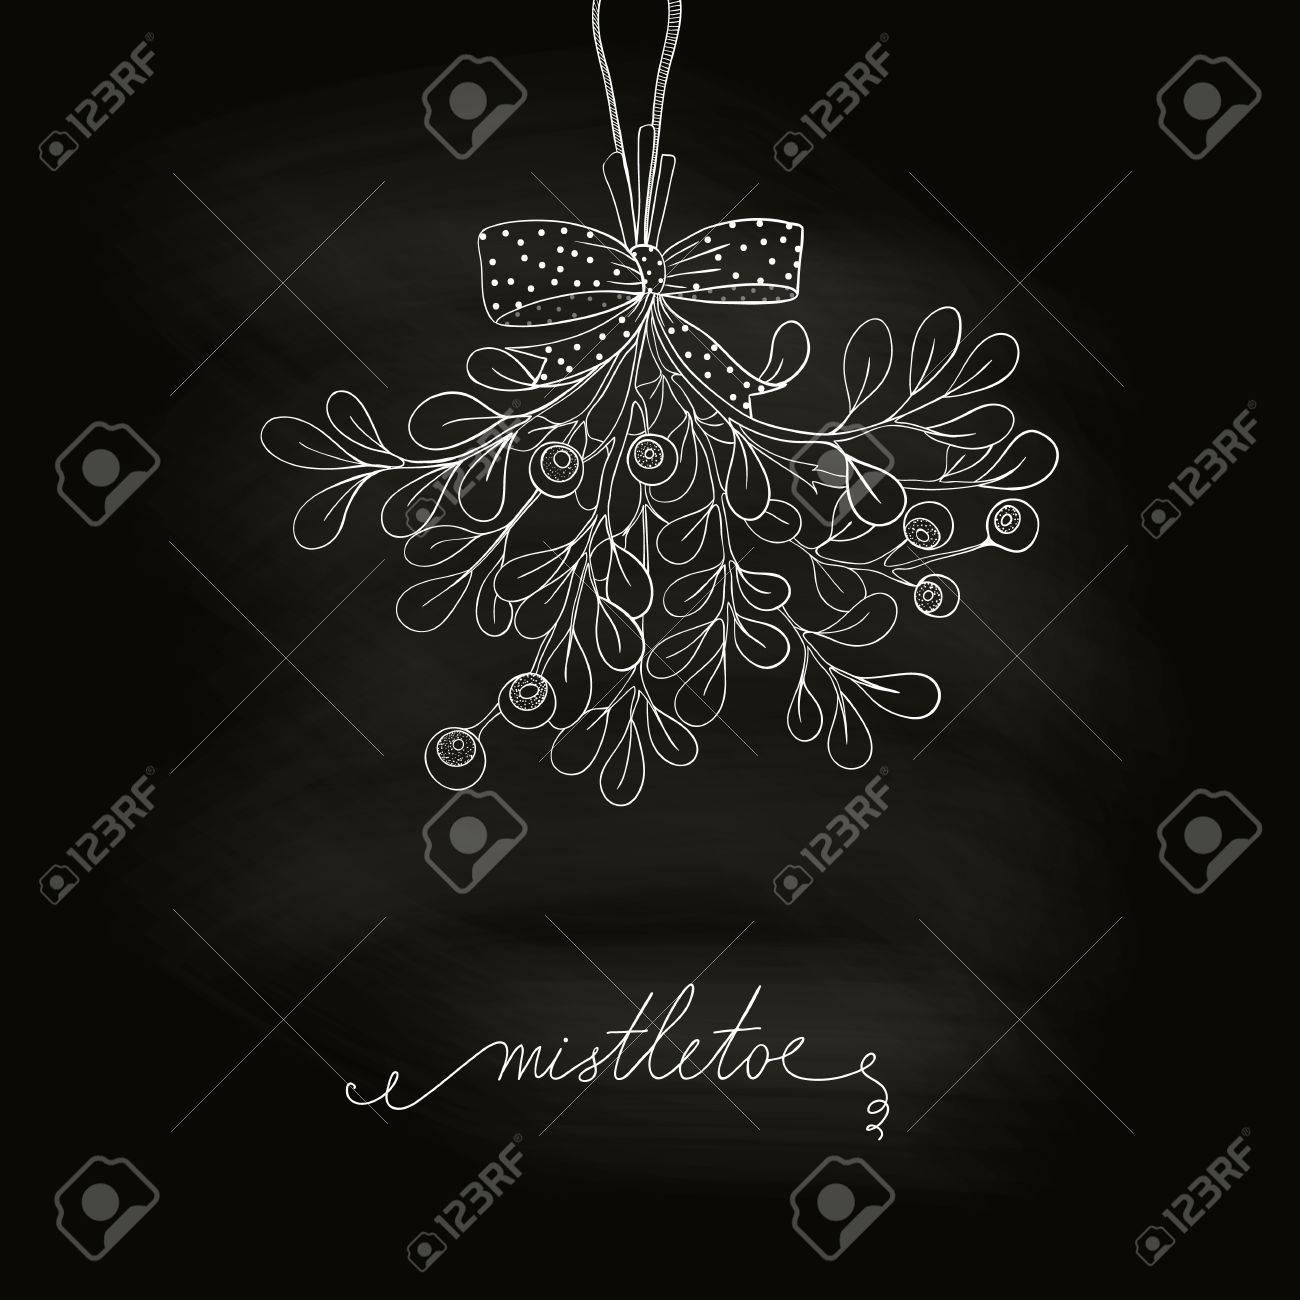 Hand Drawn Mistletoe In Blackboard Vector Christmas Plant Made Chalkboard Background Romantic